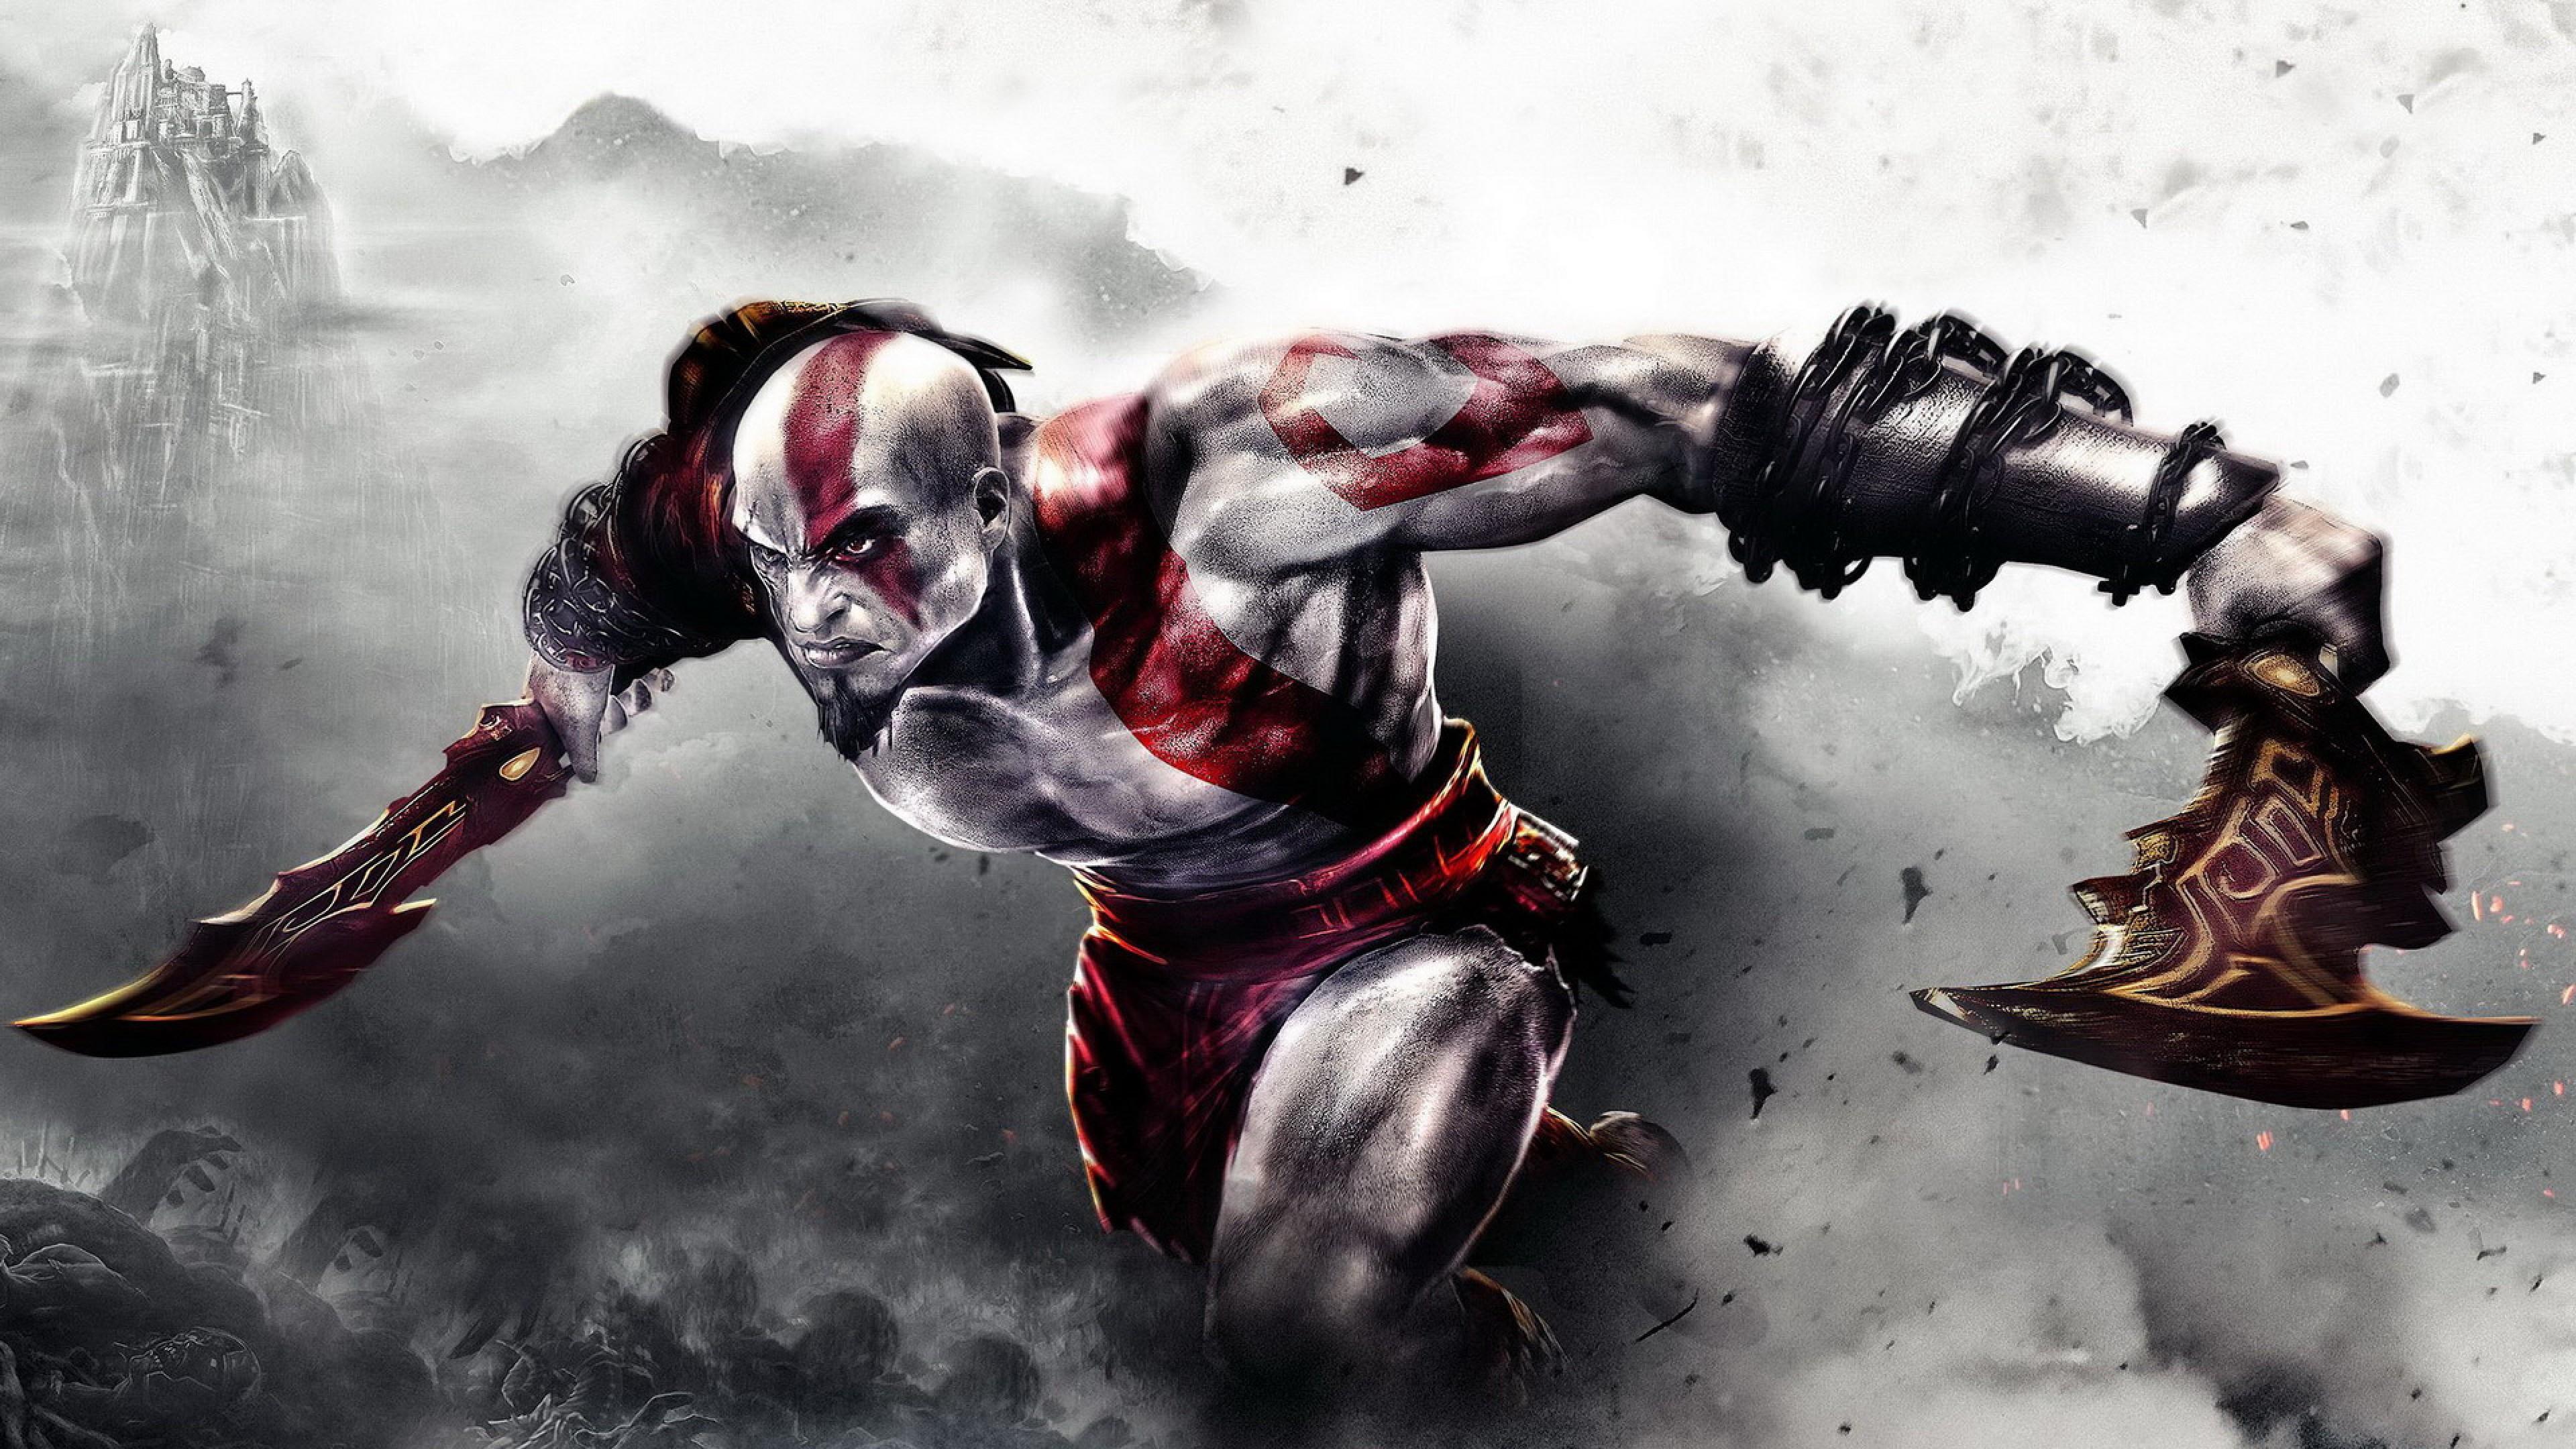 Kratos God Of War Hd Wallpaper For Desktop And Mobiles 4k